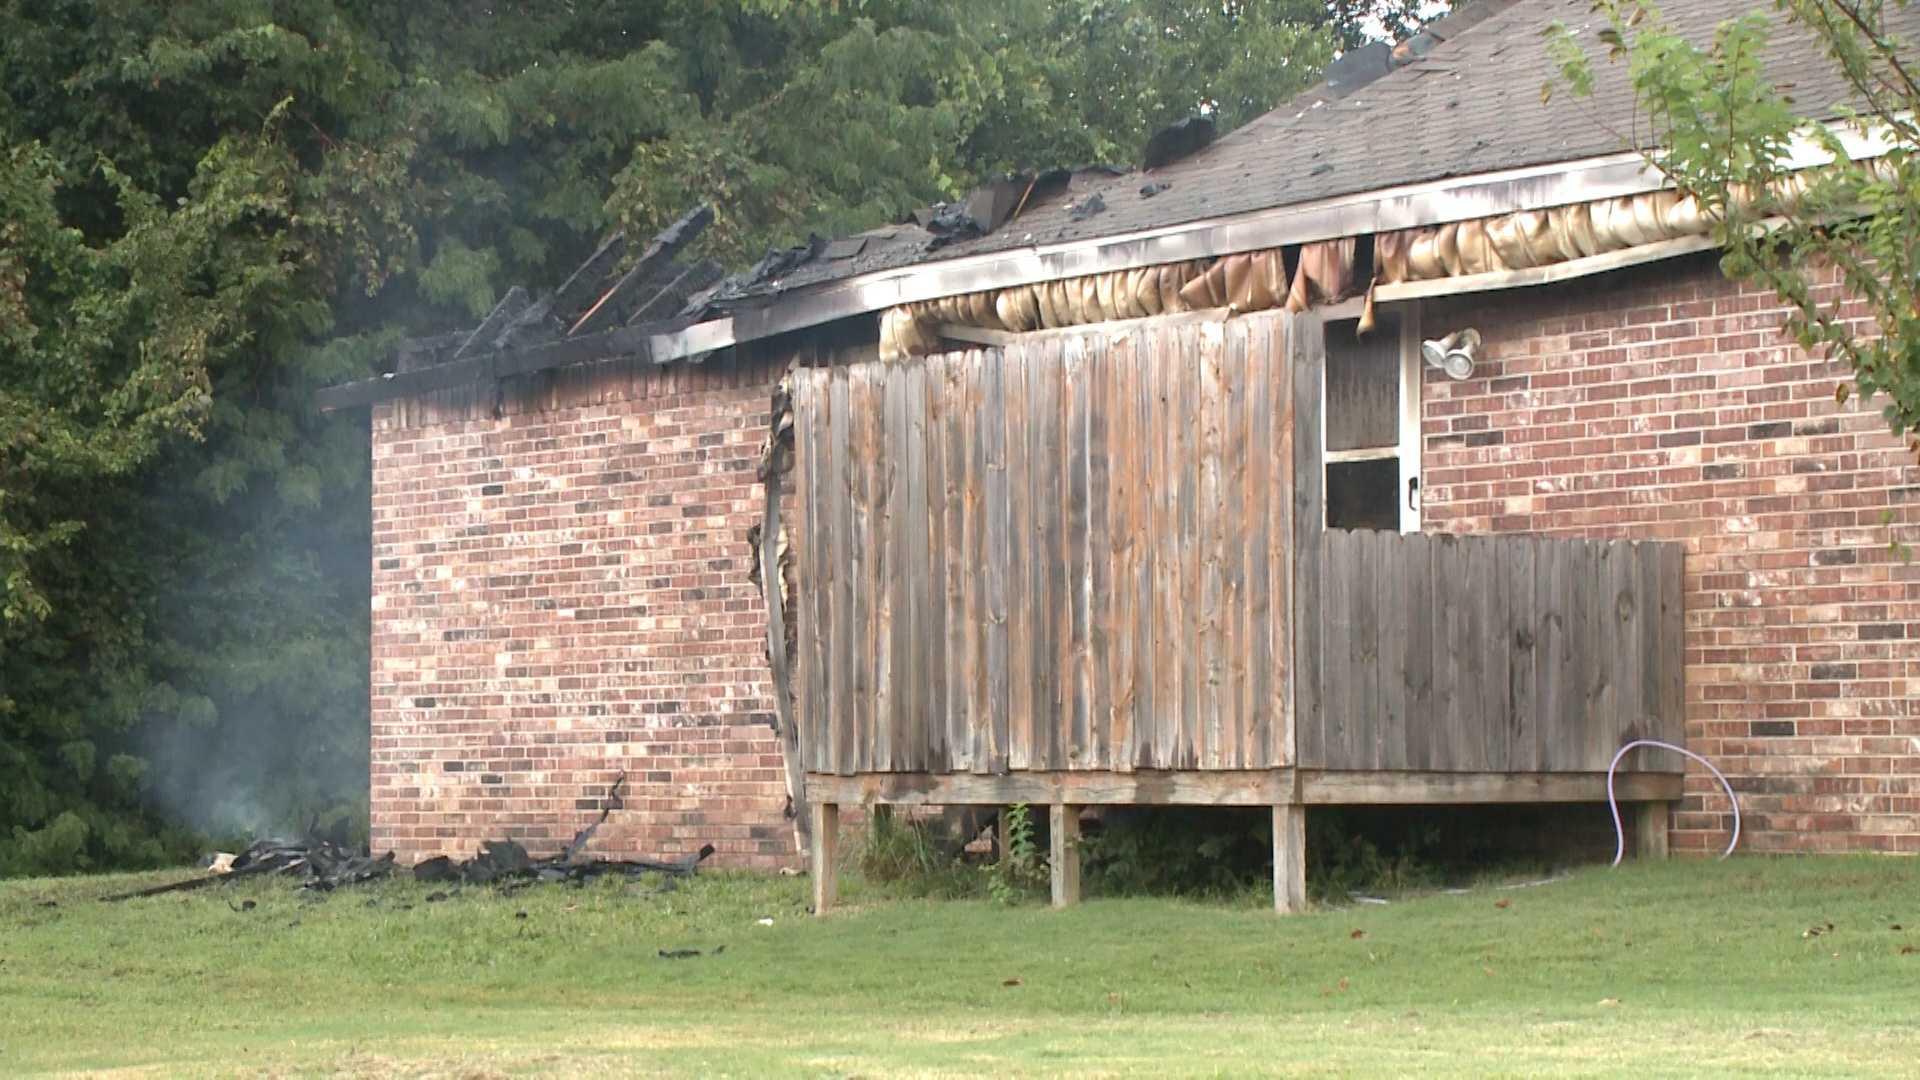 house fire damage fayetteville